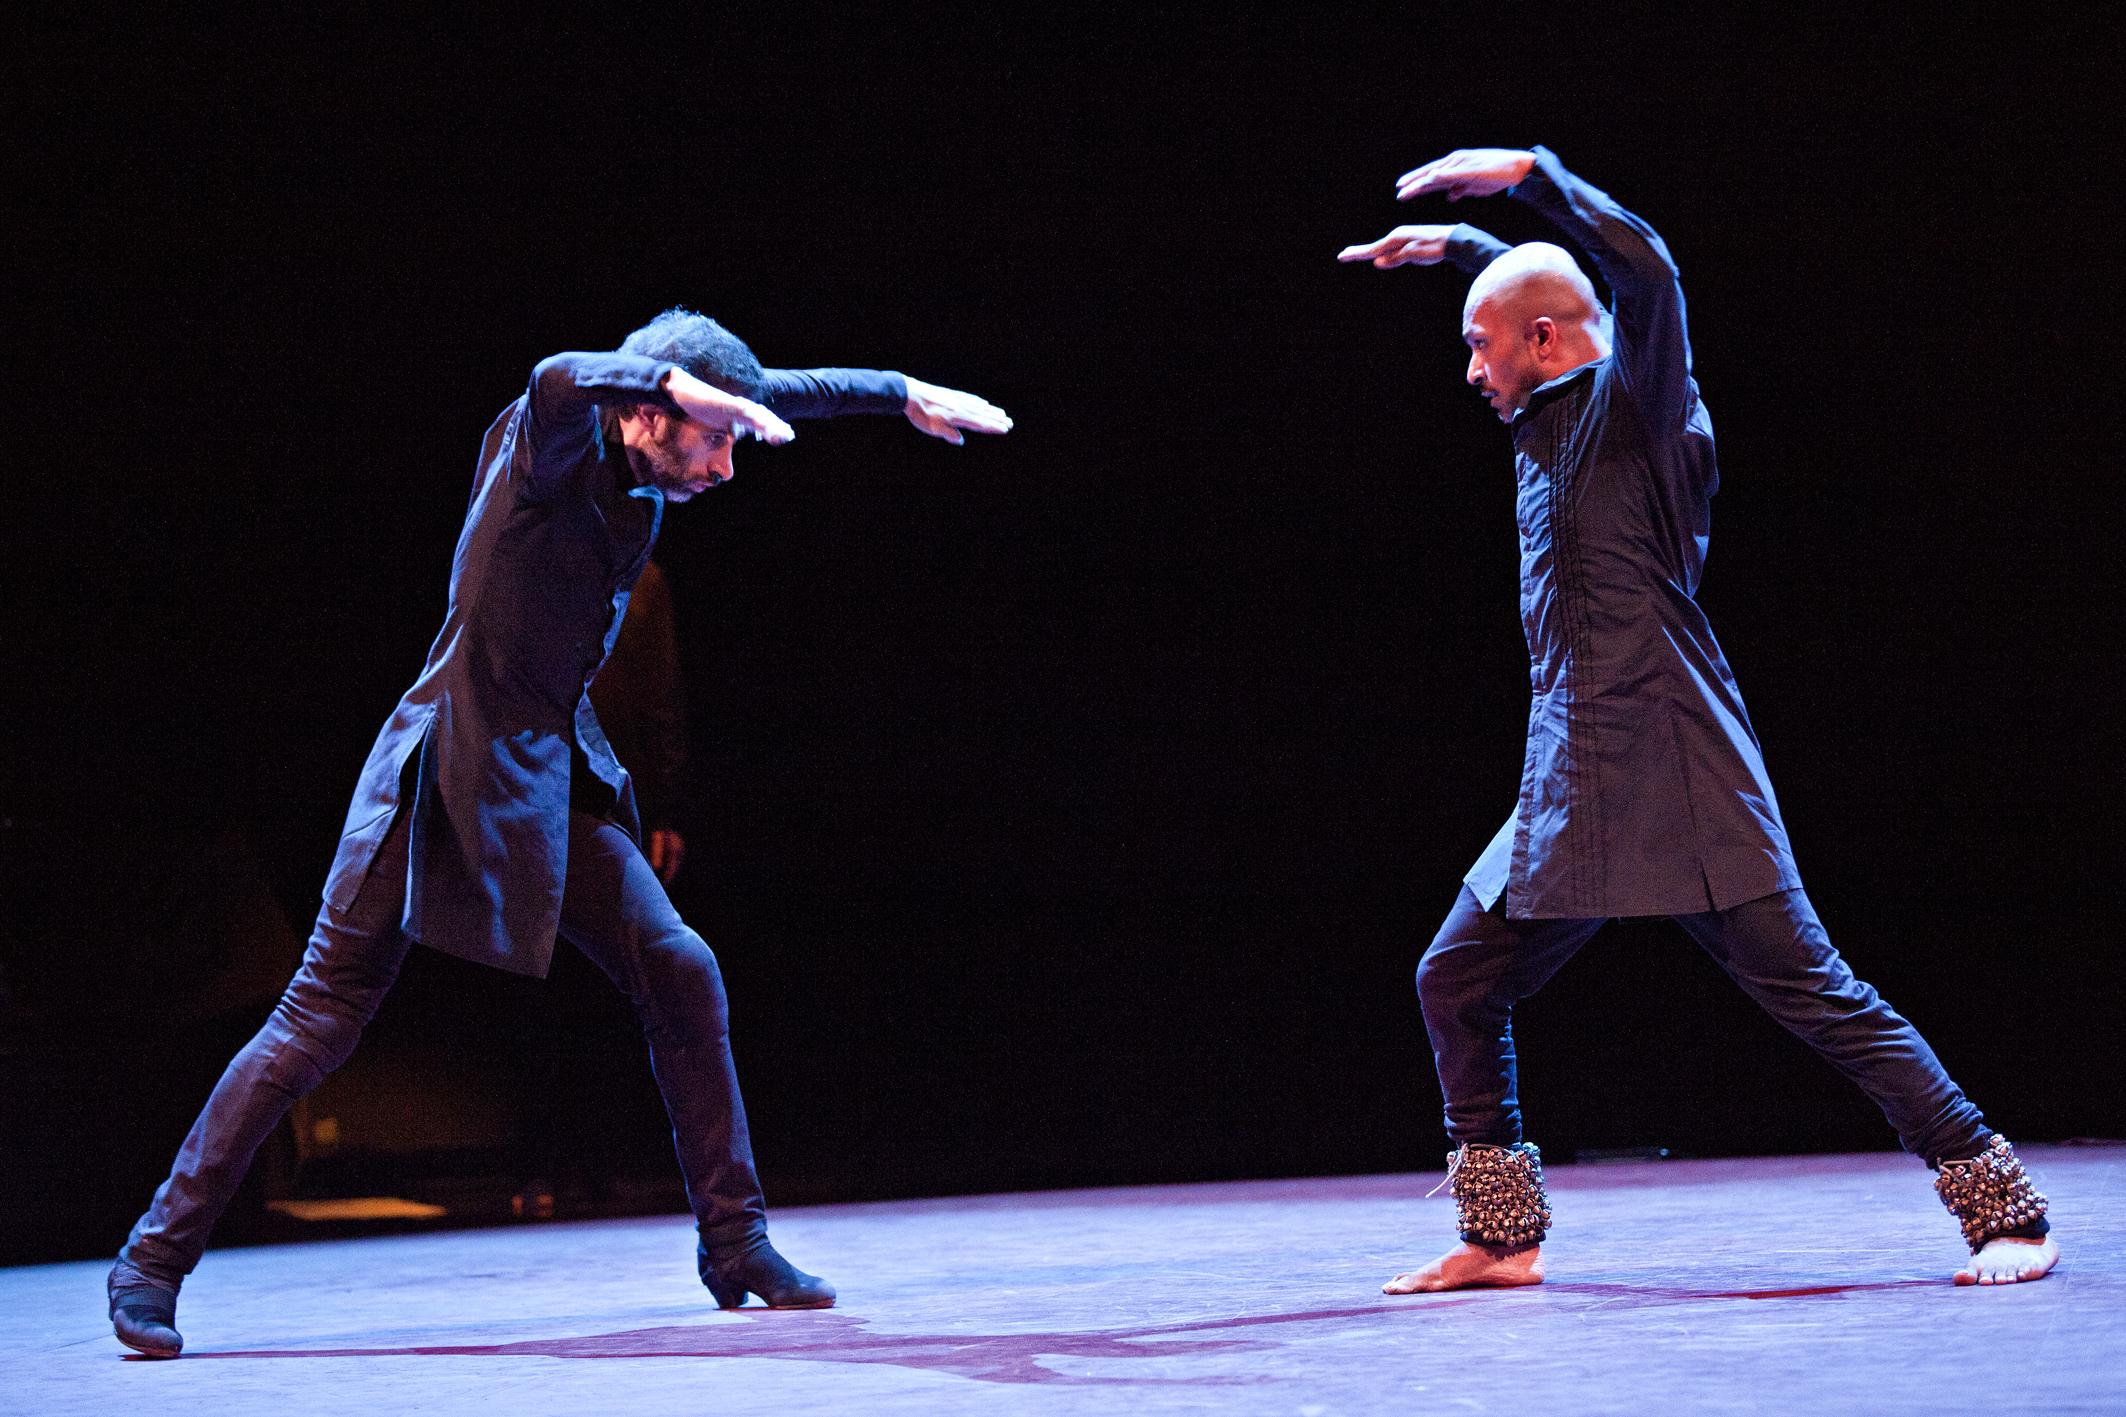 Torobaka - dance